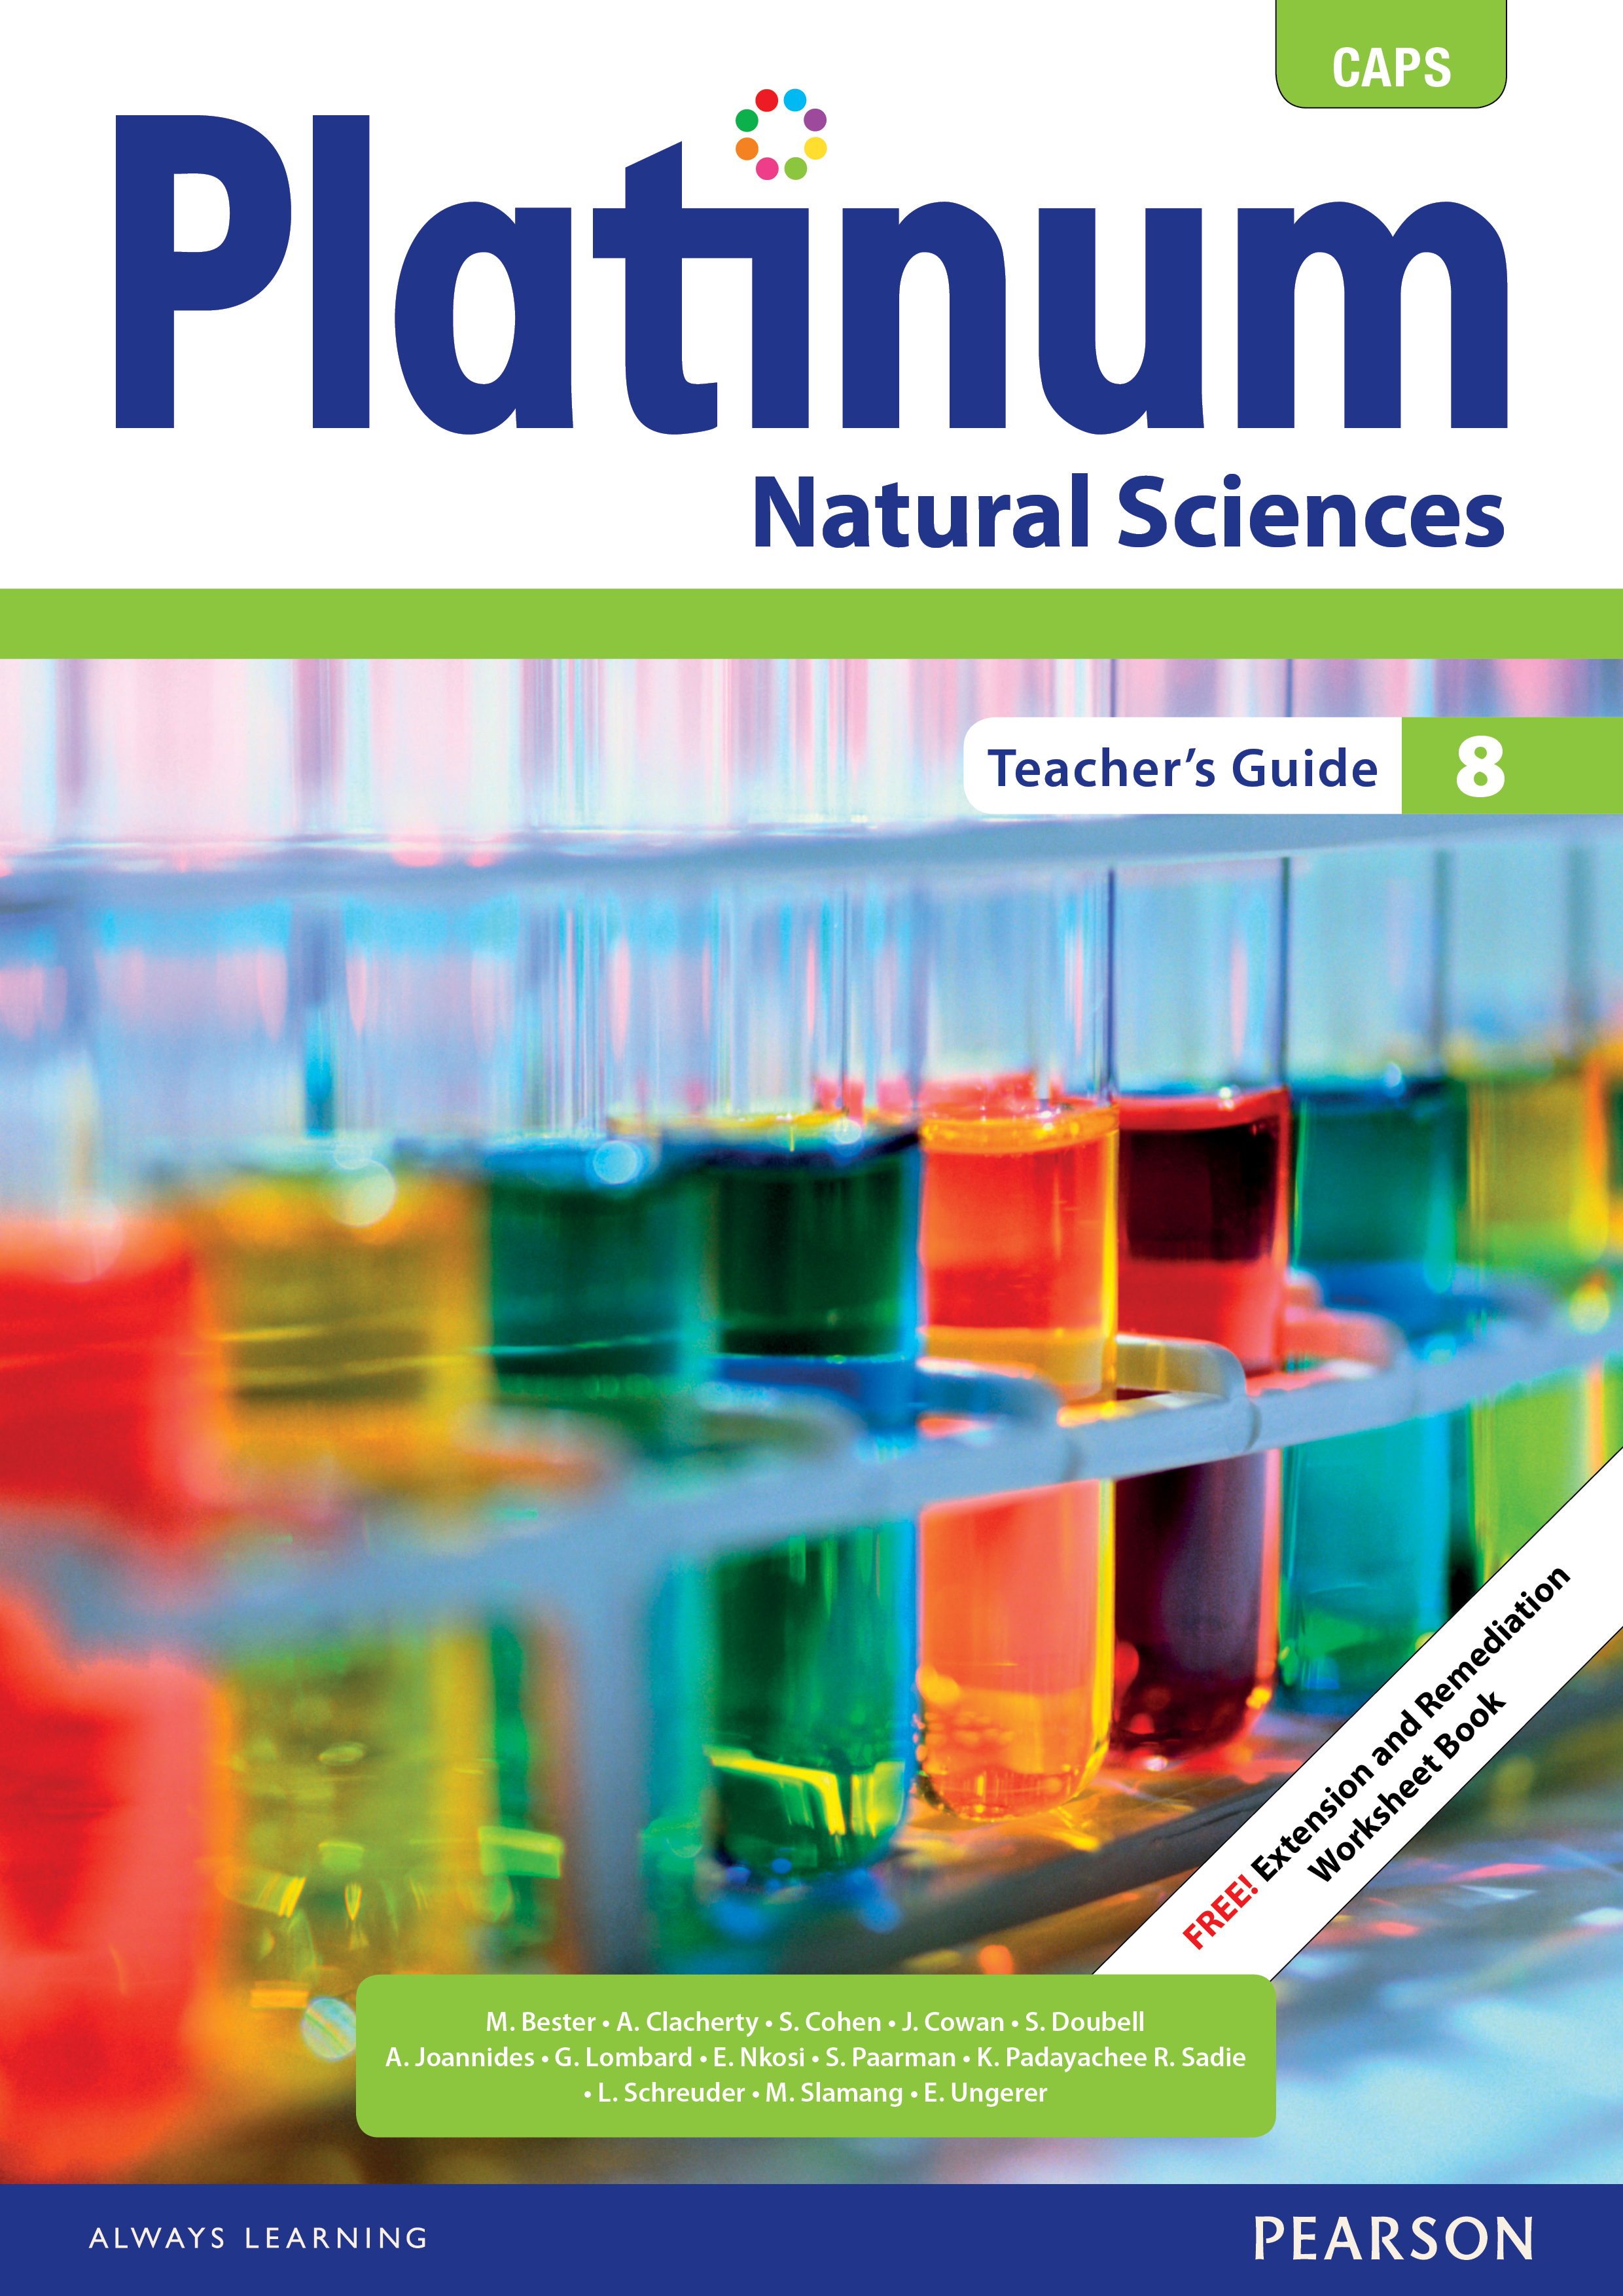 platinum natural sciences grade 8 teacher s guide epdf perpetual rh wcedeportal co za platinum technology grade 8 teacher's guide pdf platinum english grade 8 teacher's guide